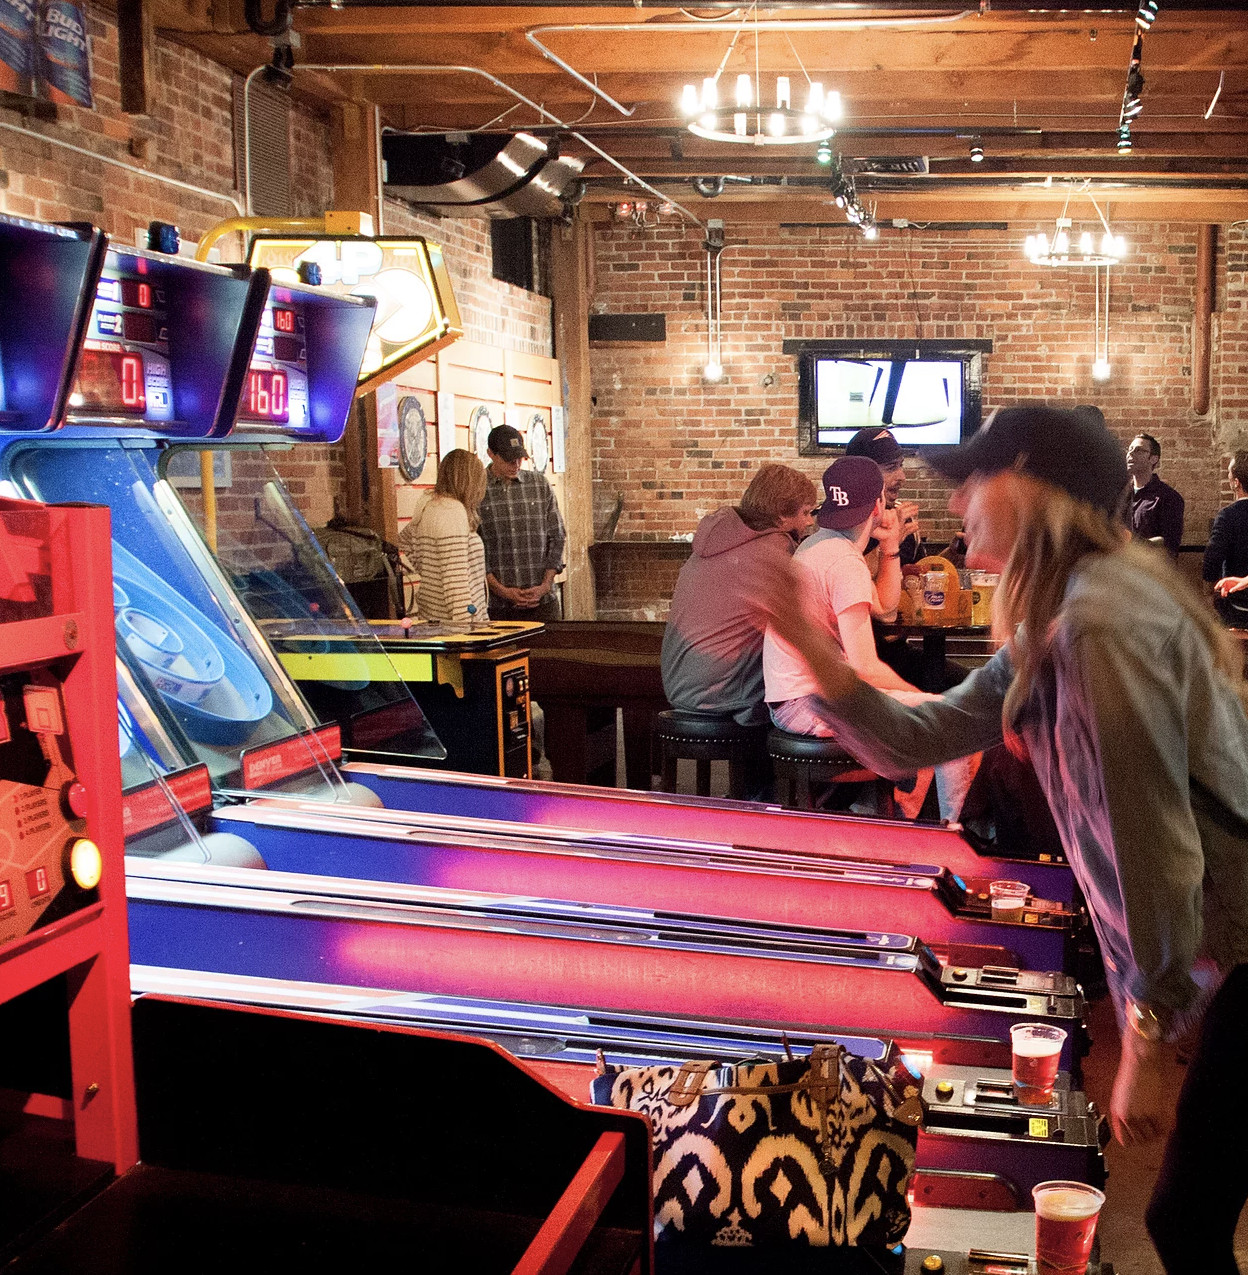 Skeeball for Parties